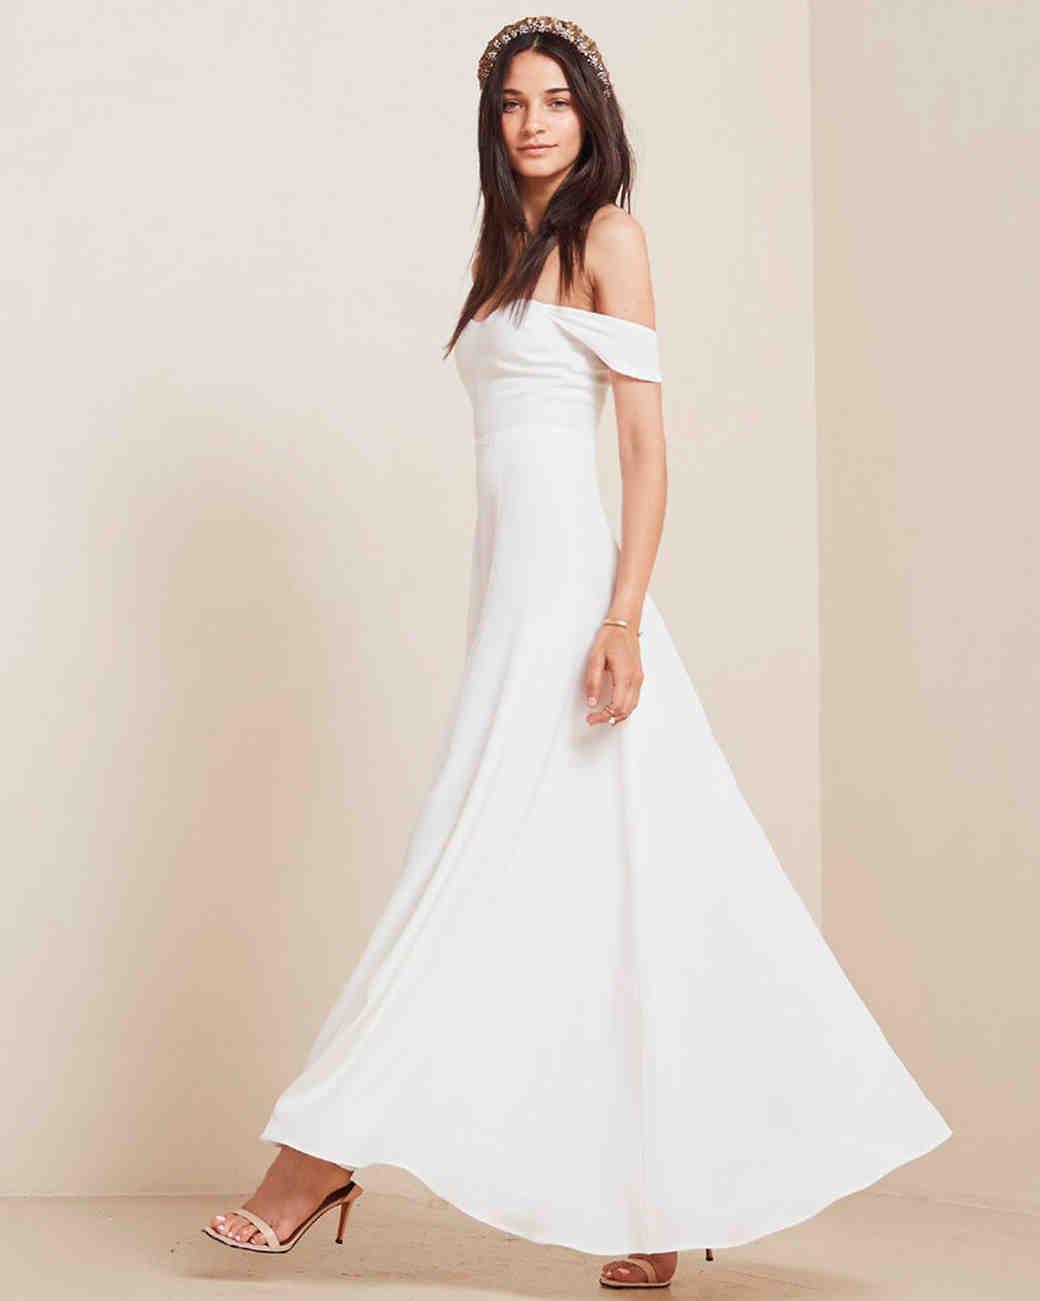 little-white-dress-reformation-gown-588-1115.jpg